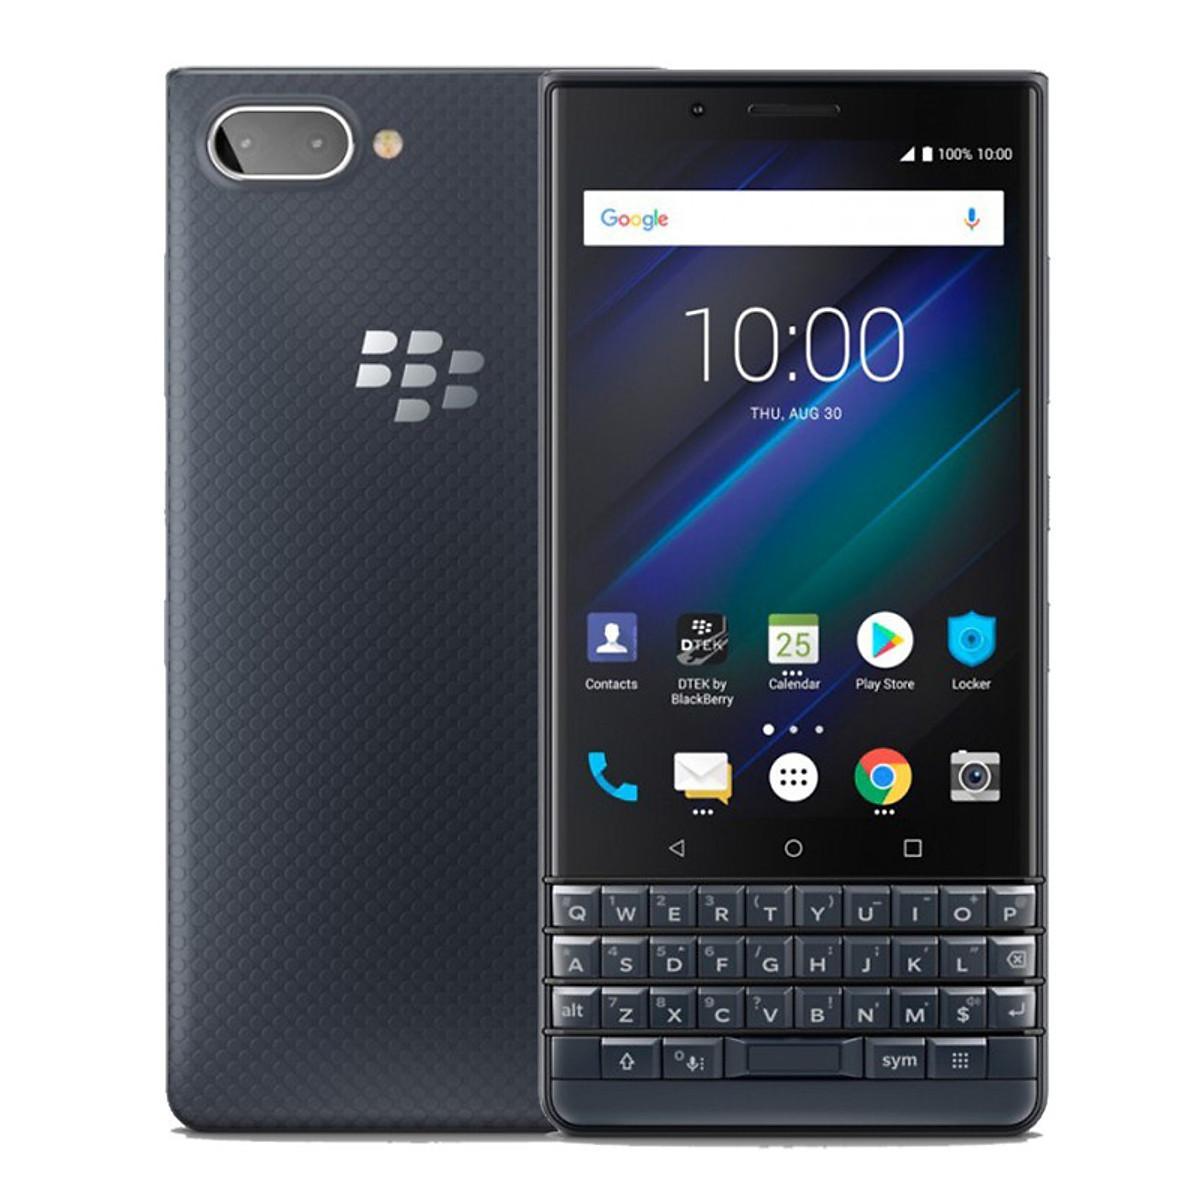 Review Điện Thoại Blackberry Key2 LE (64GB/4GB)